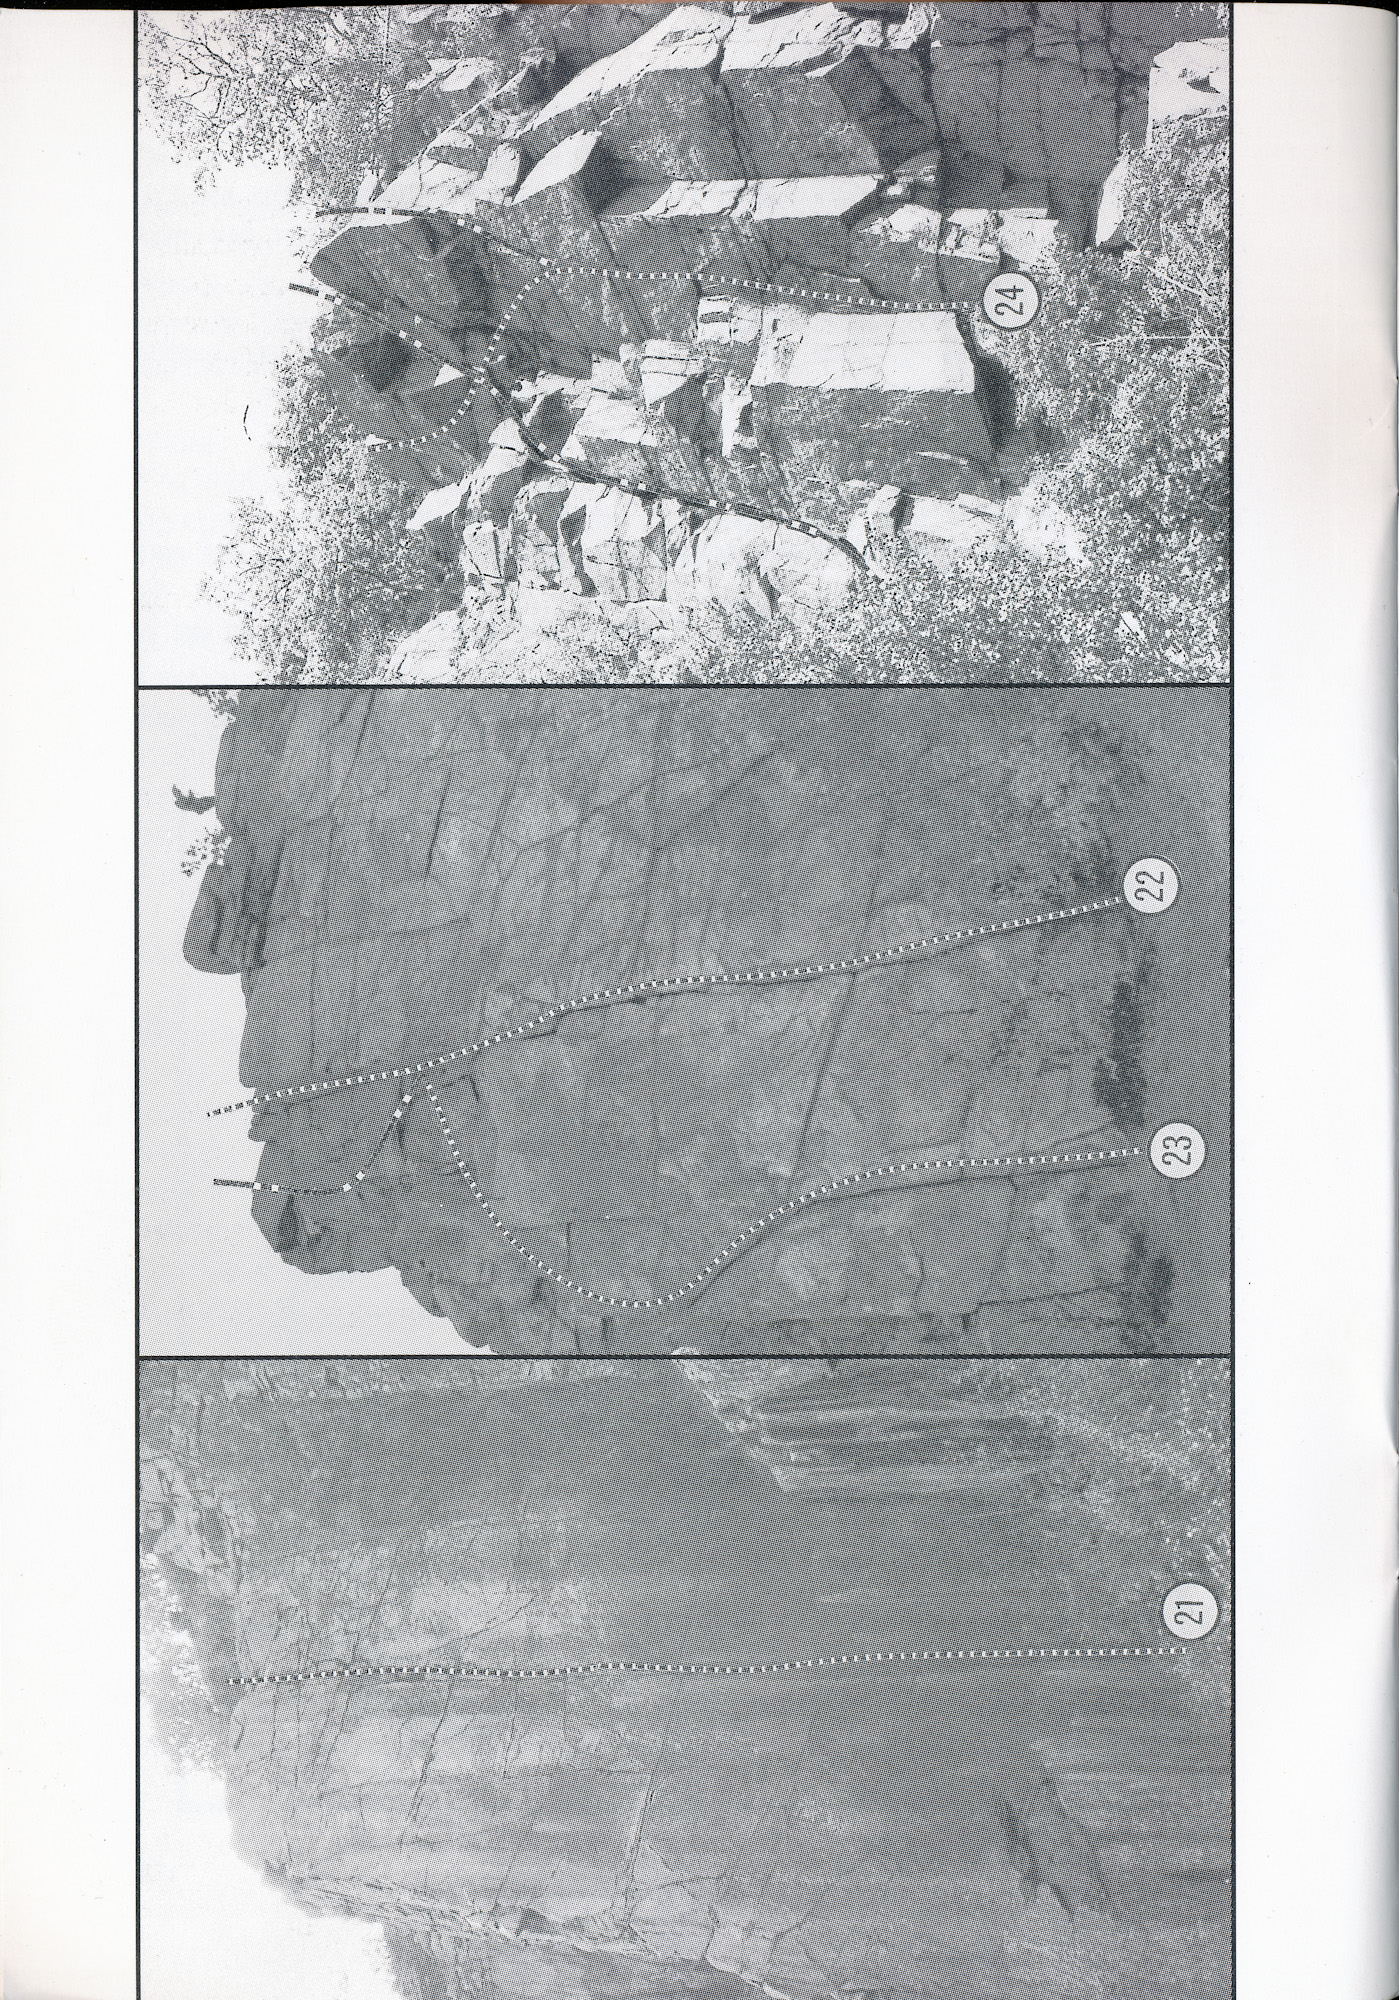 50 udvalgte ruter paa bornholm 1995 18.jpg